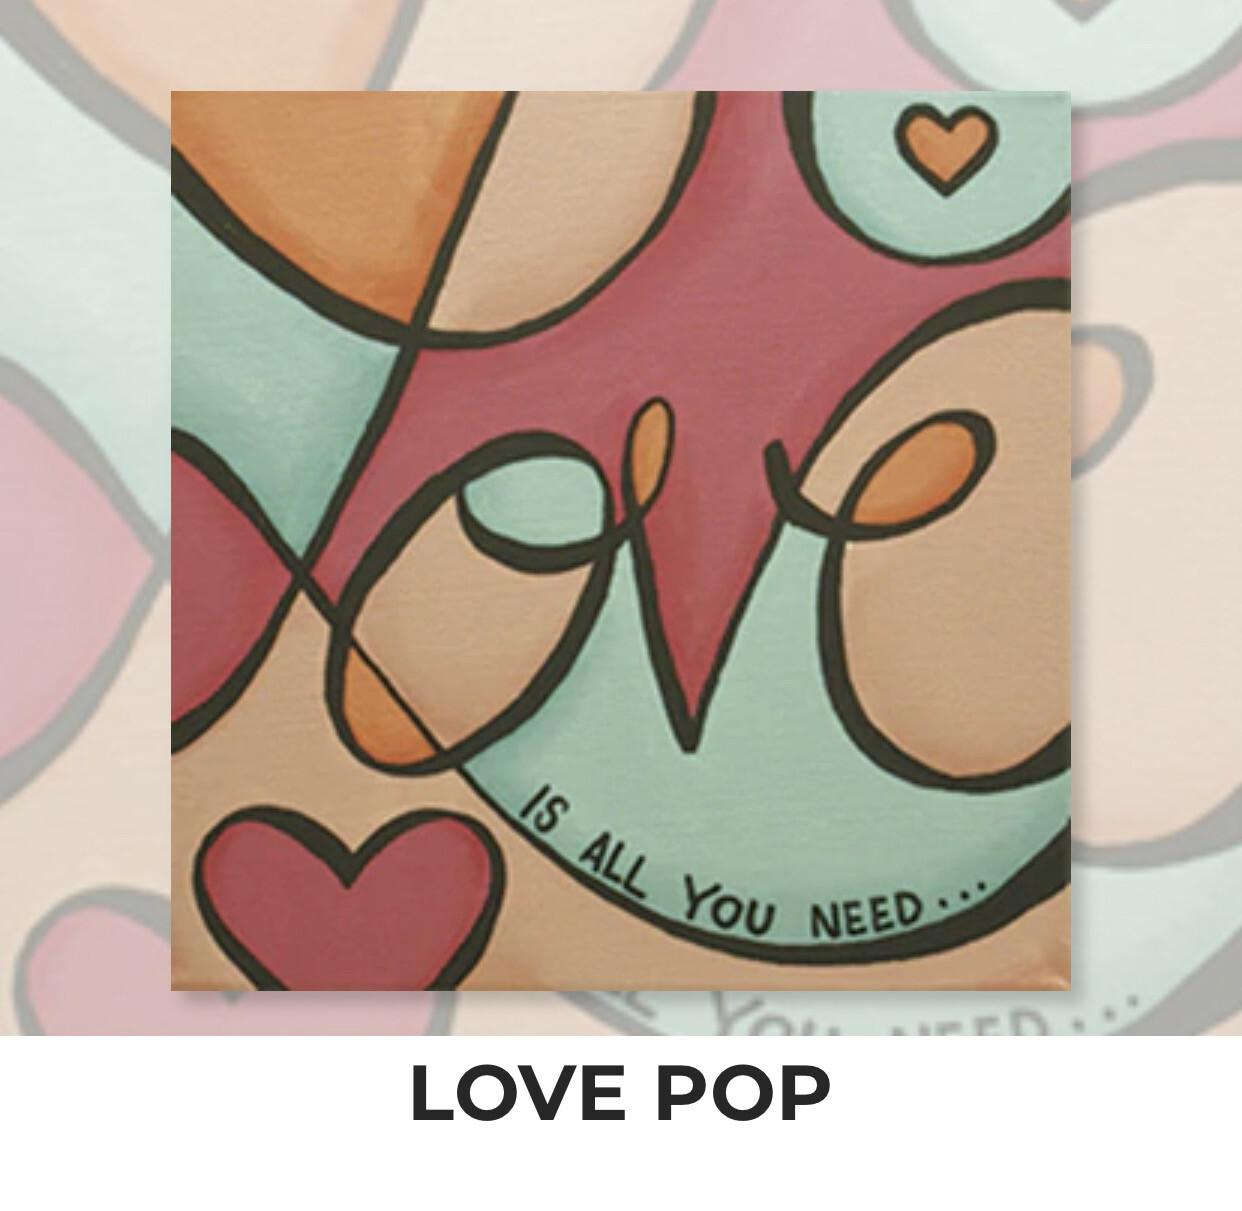 Love Pop KIDS Acrylic Paint On Canvas DIY Art Kit